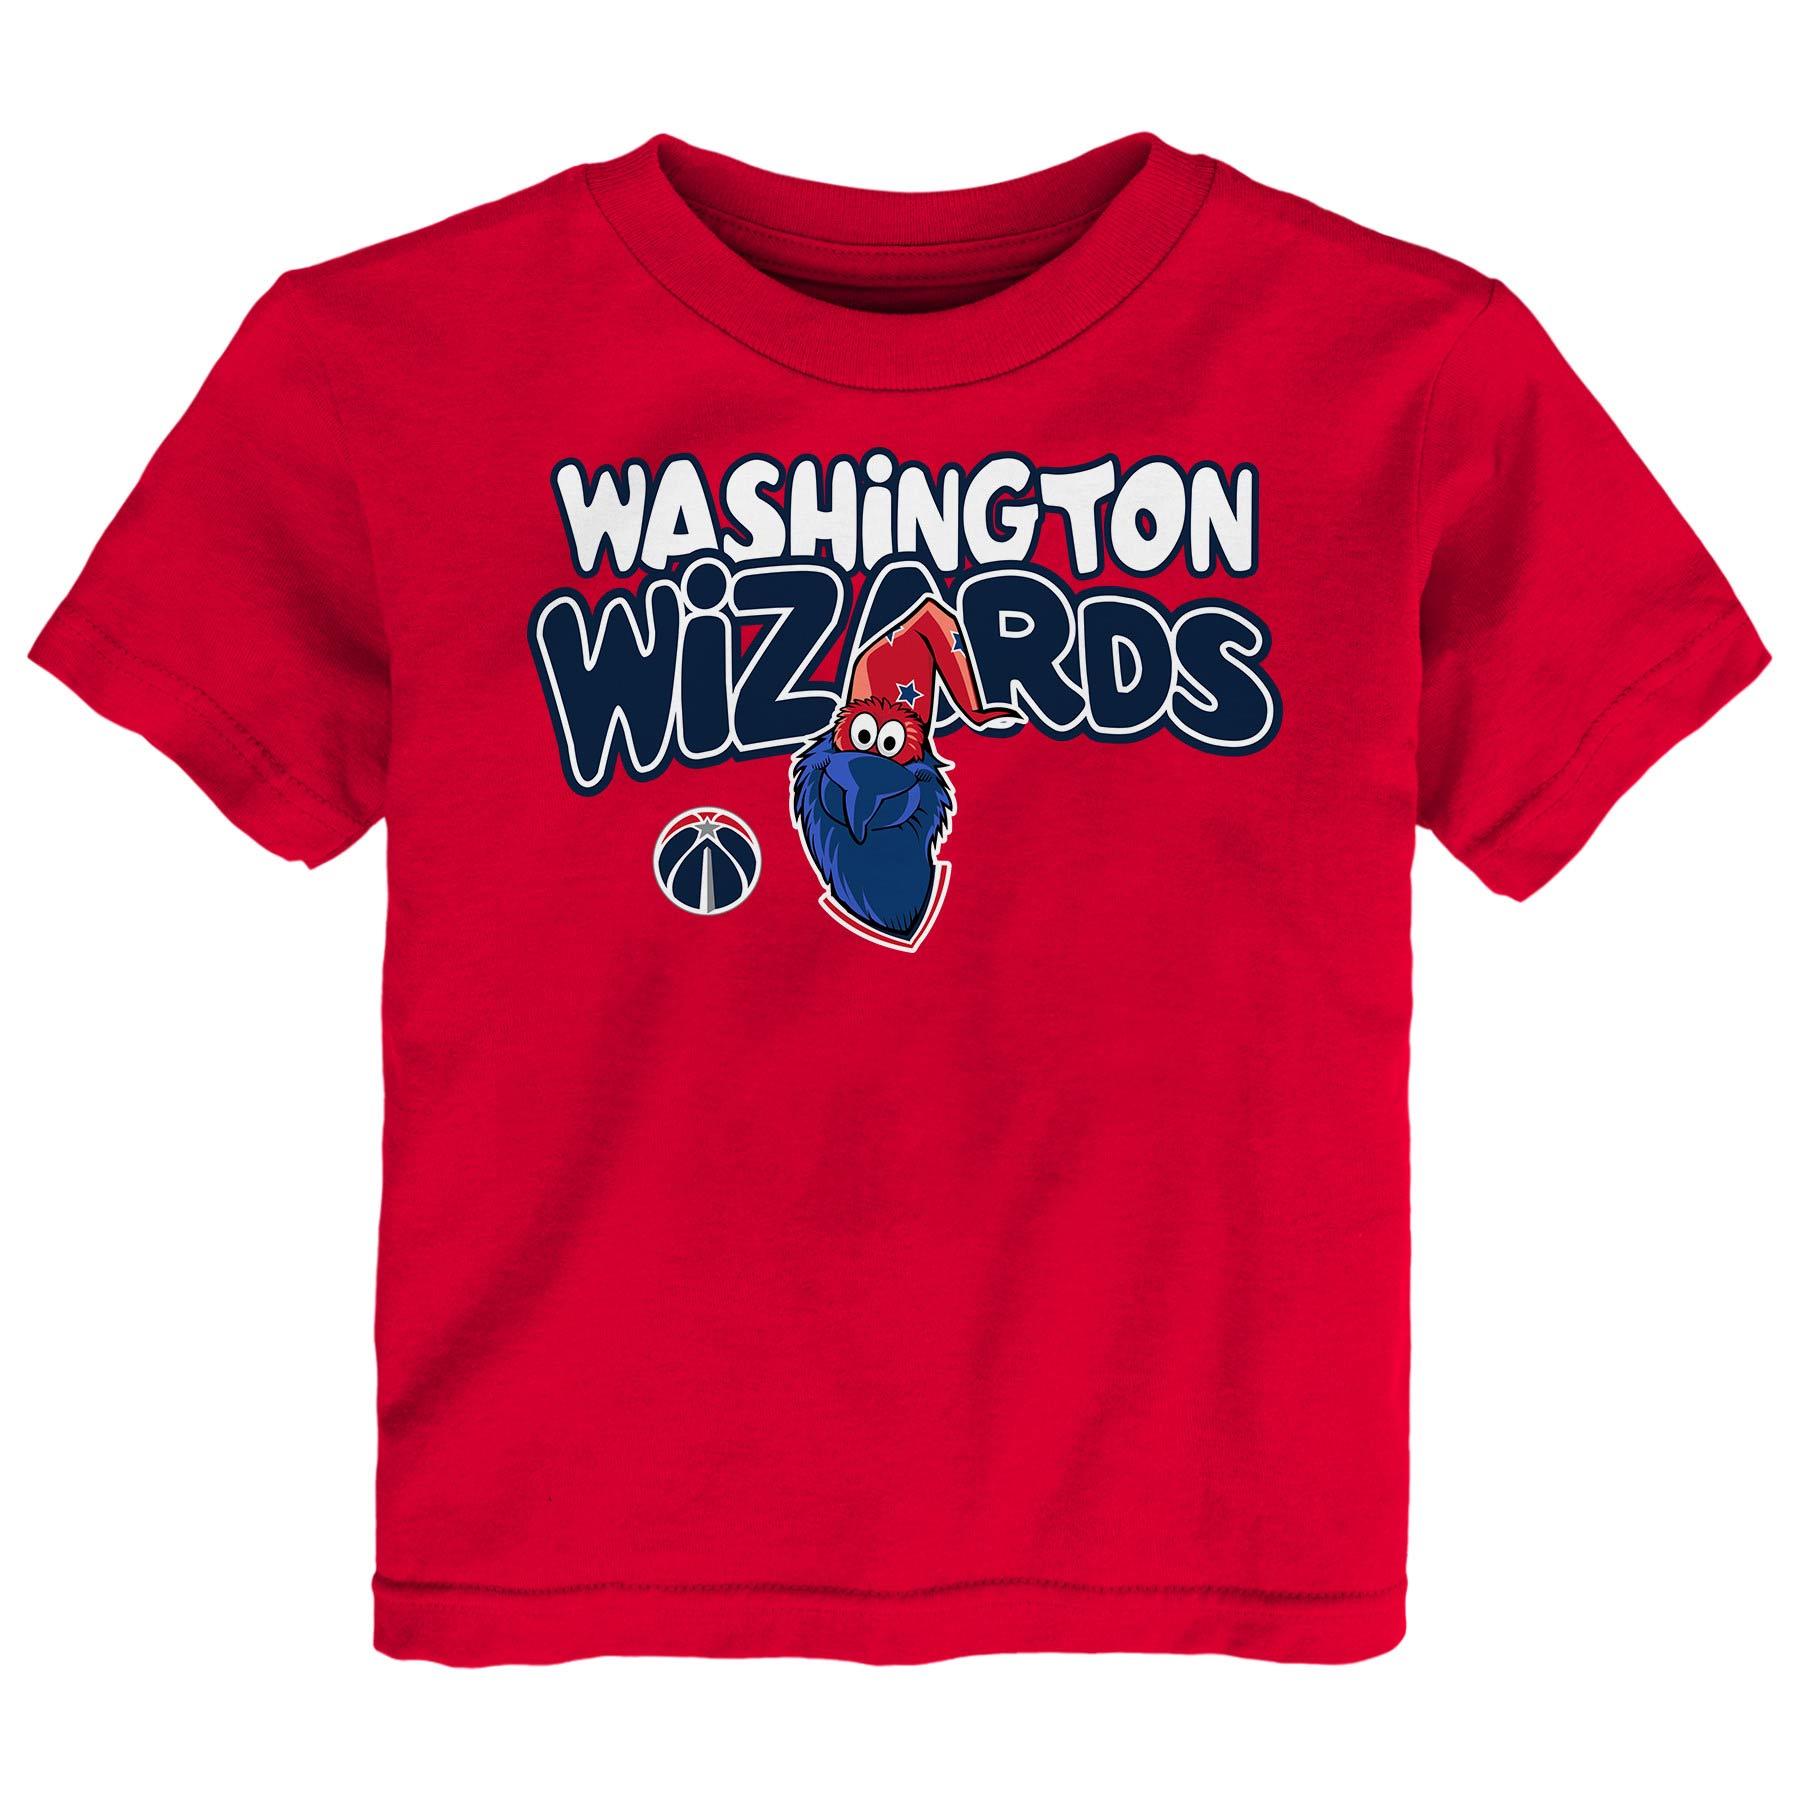 Washington Wizards Preschool & Toddler Bubble Letter T-Shirt - Red